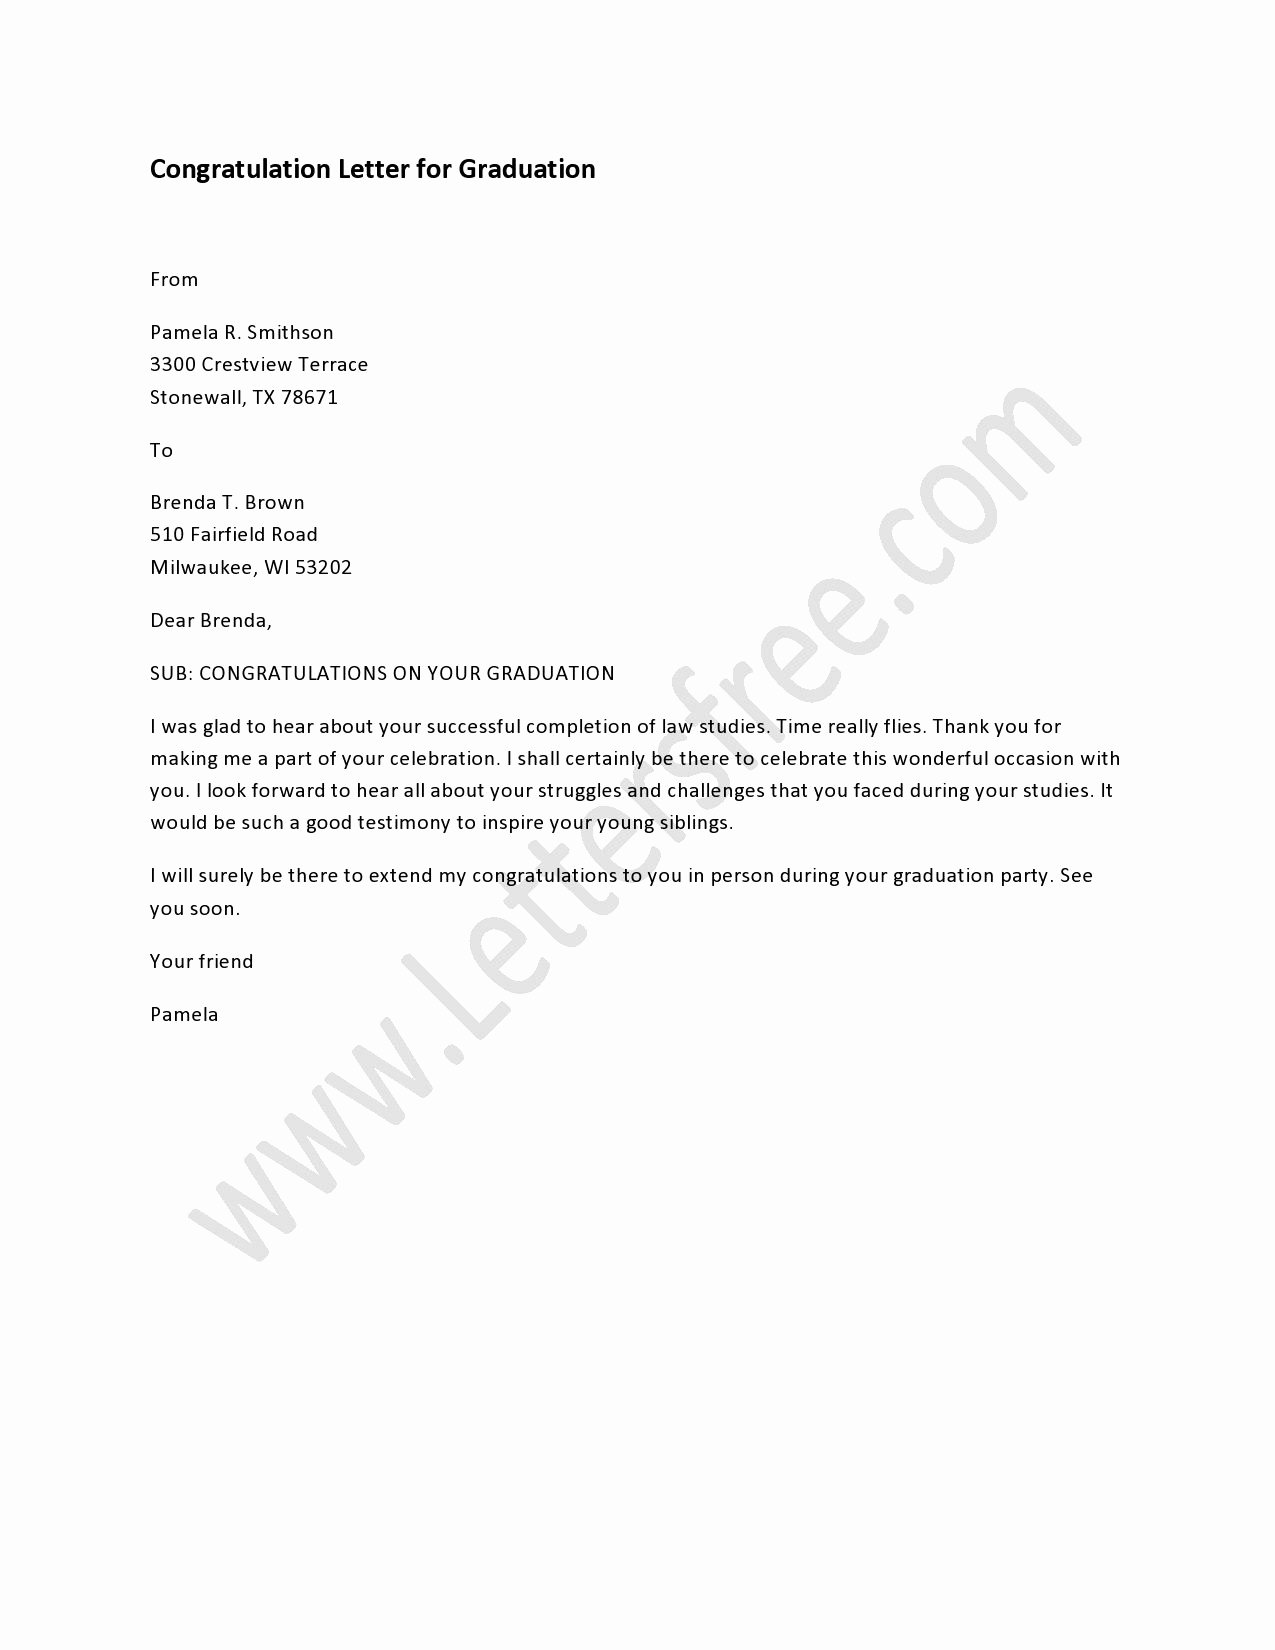 Letter for Graduation Elegant Congratulation Letter for Graduation